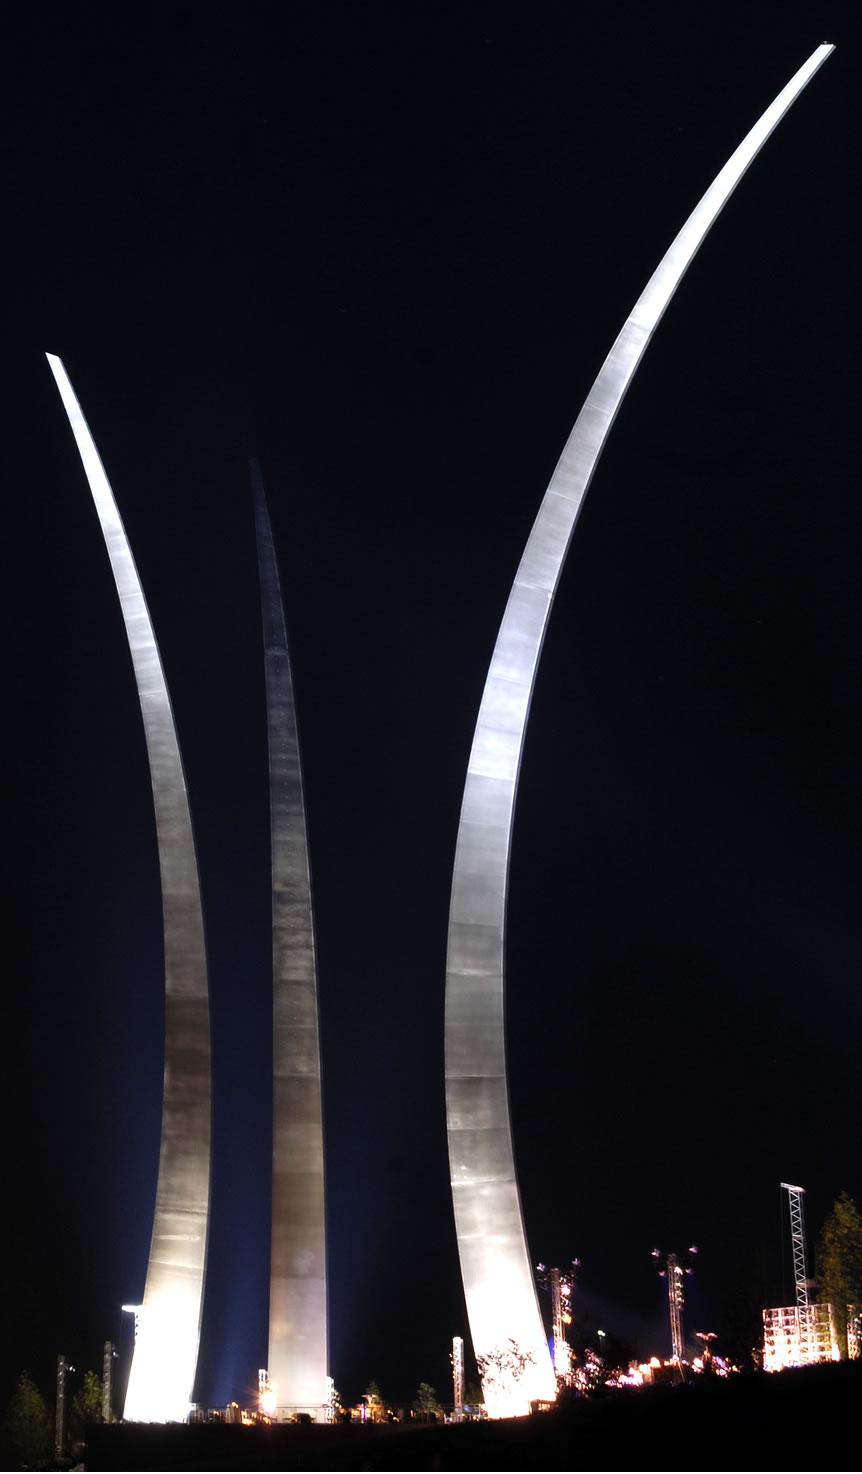 Military Photos New Us Air Force Memorial At Night